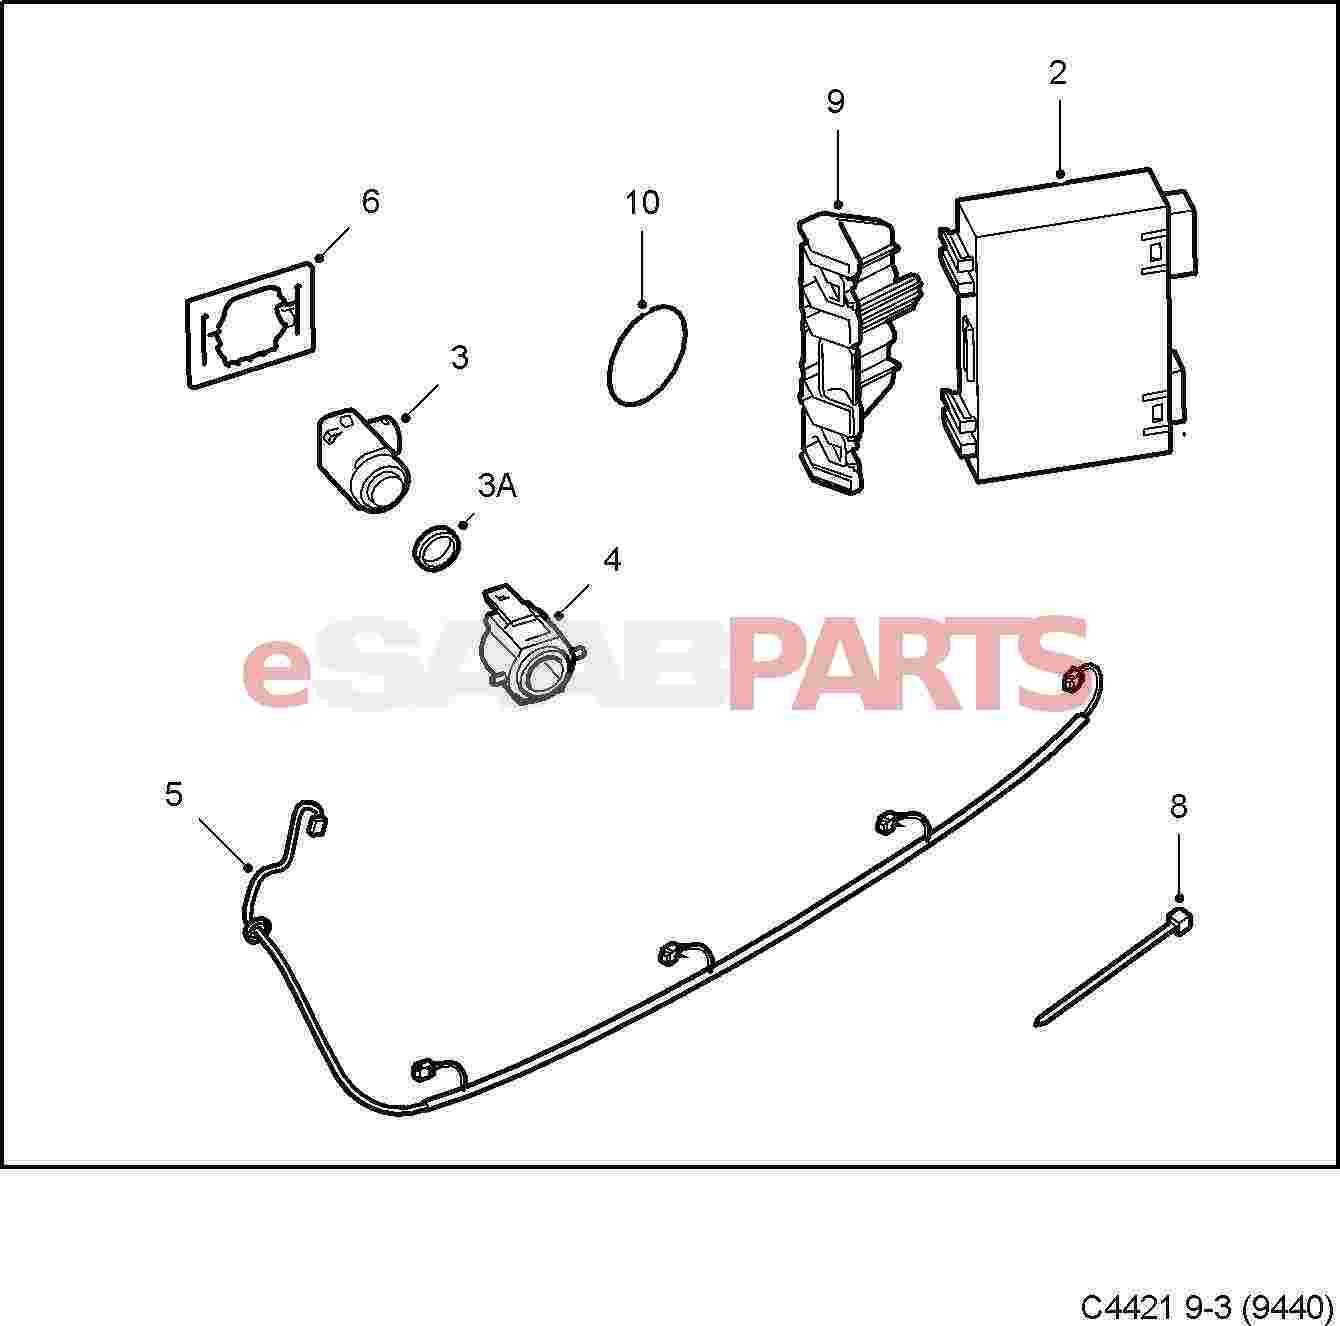 [32026045] SAAB Parking Assistance Kit (08-11 9-3